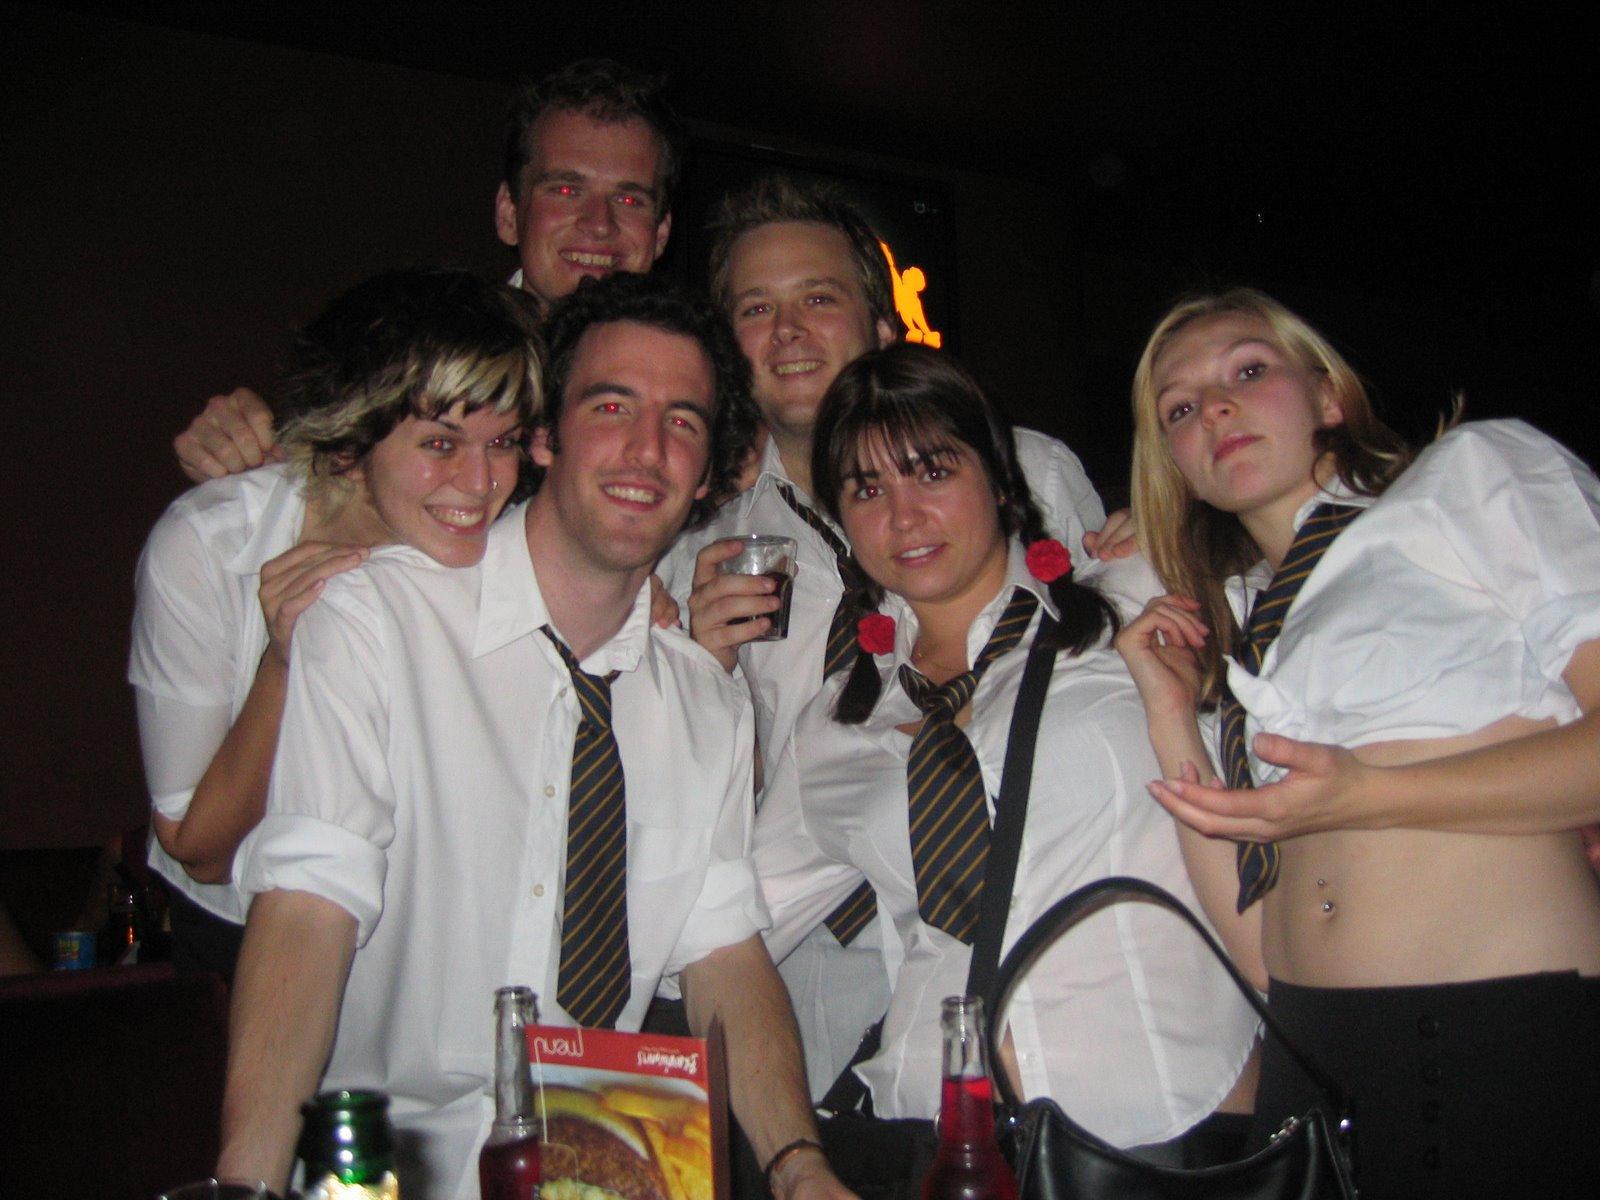 Nothing like a school disco night!